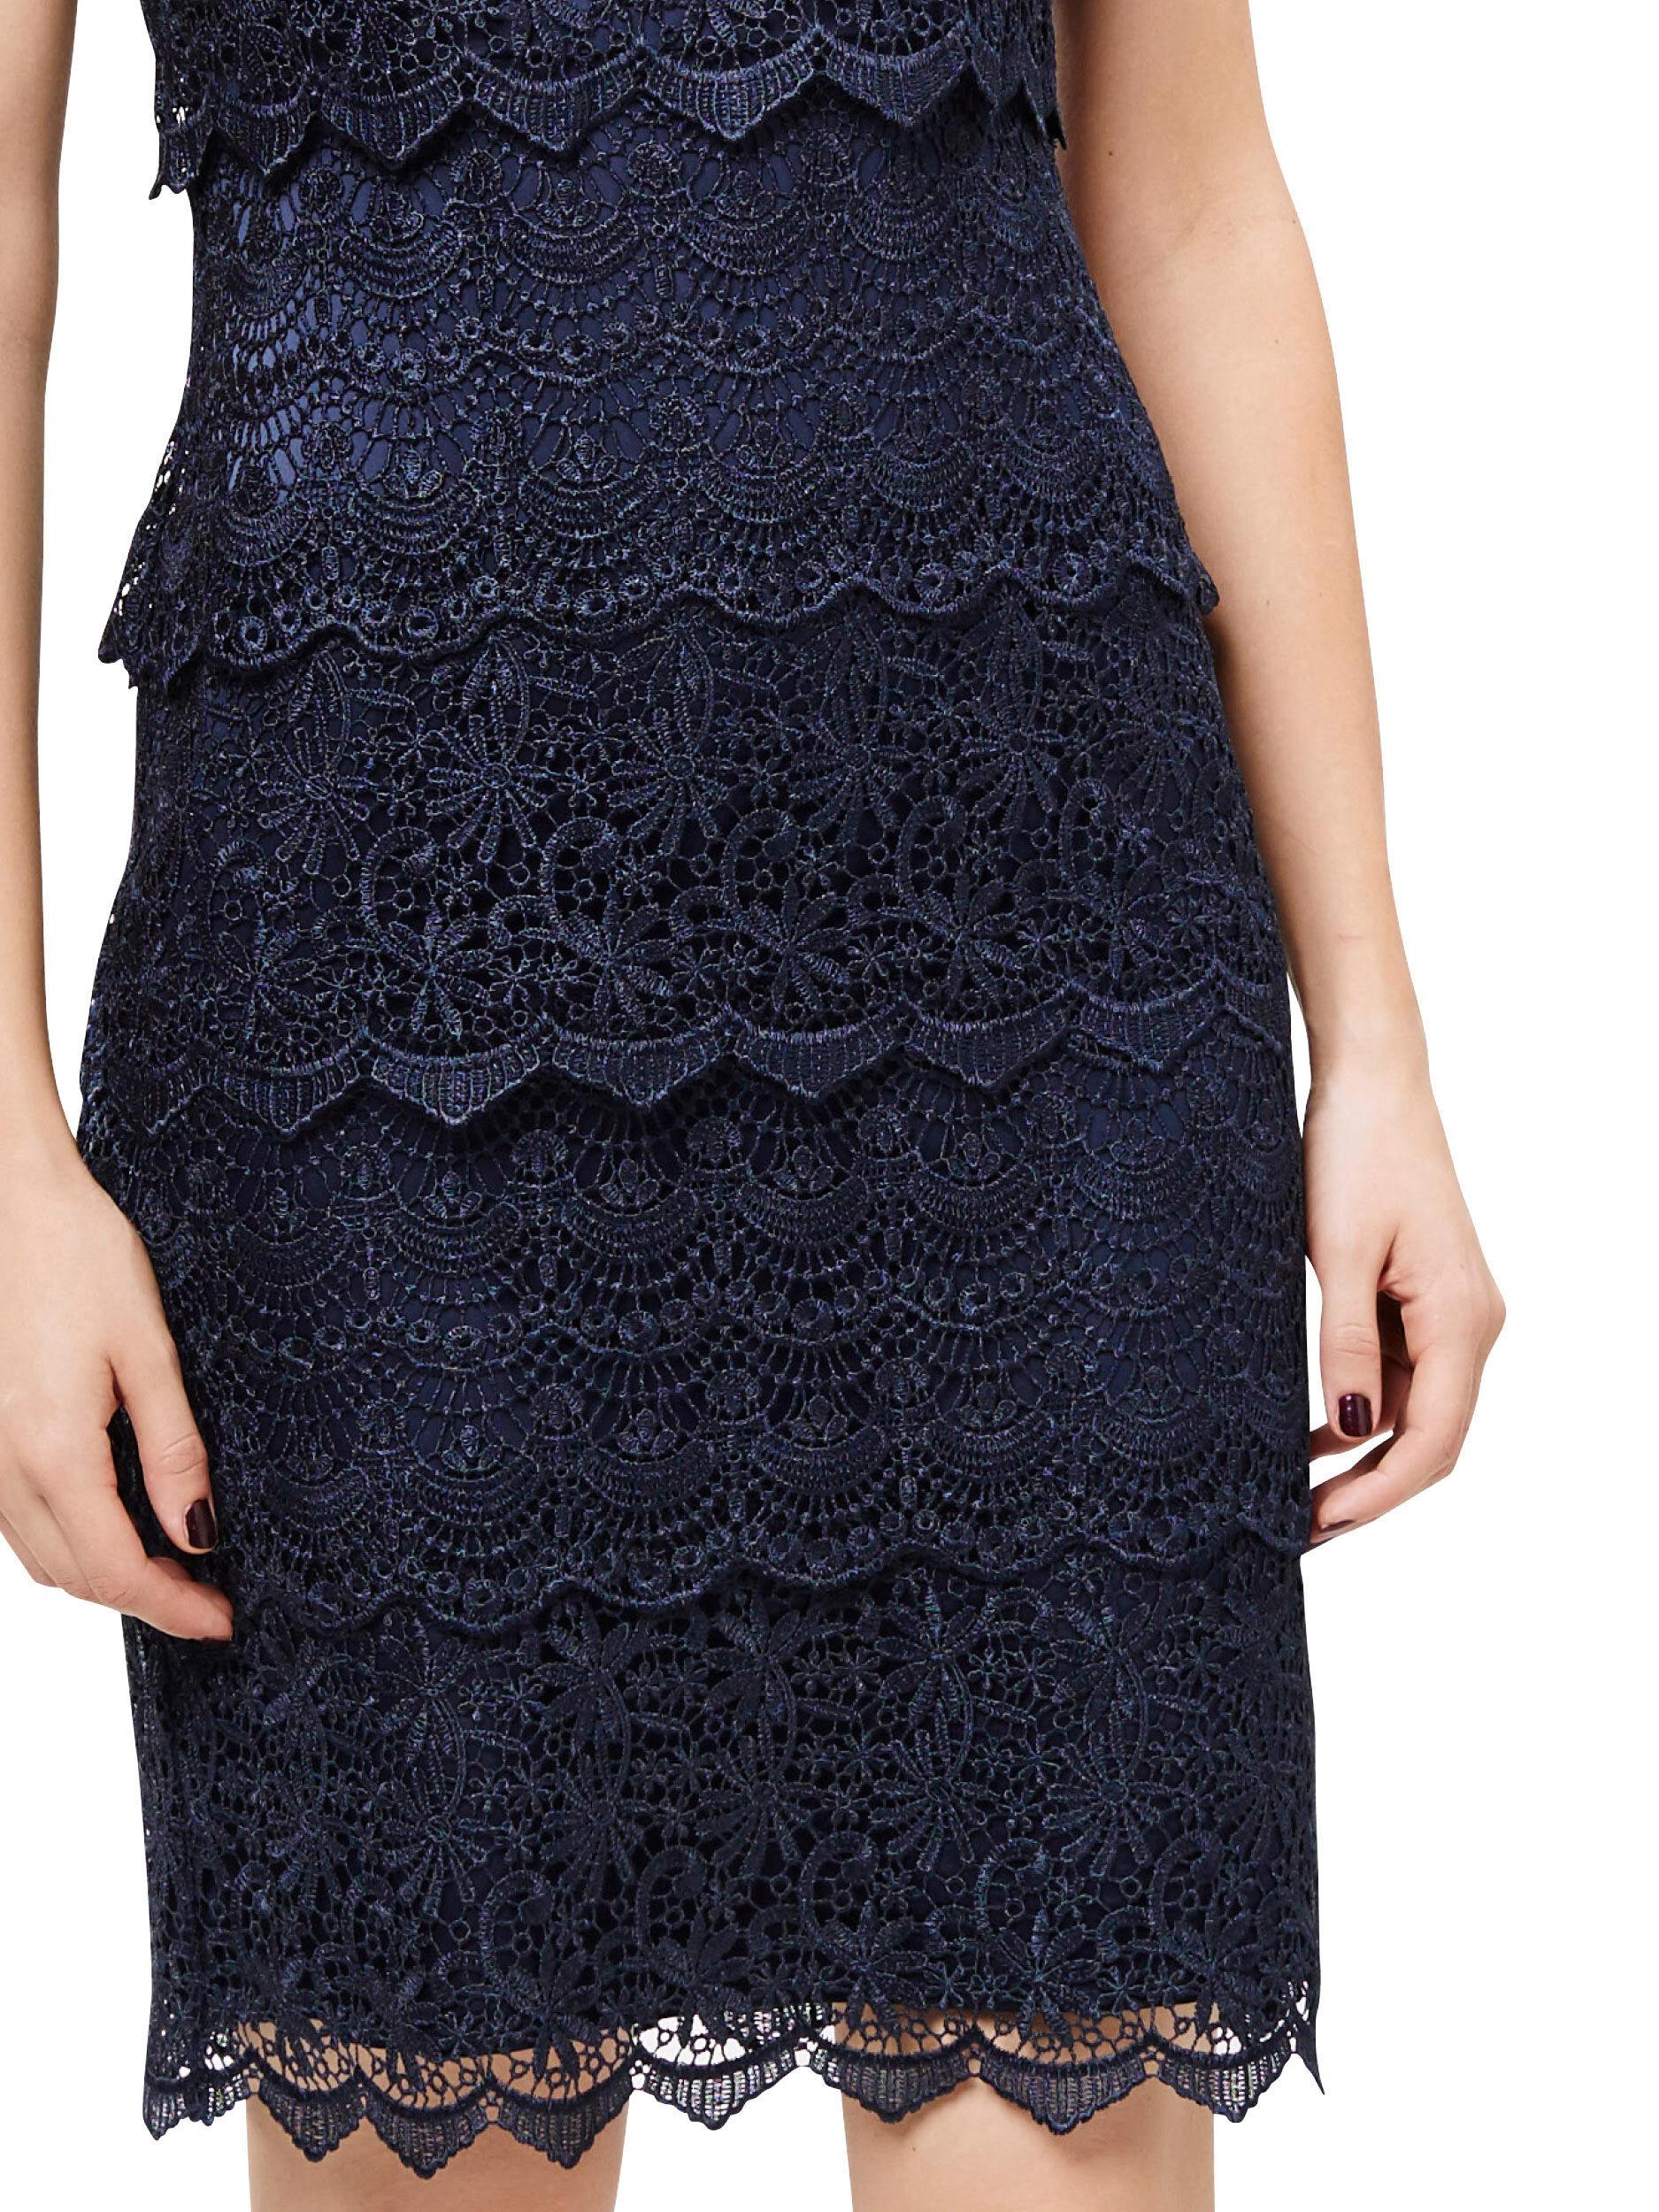 Santana Lace Dress